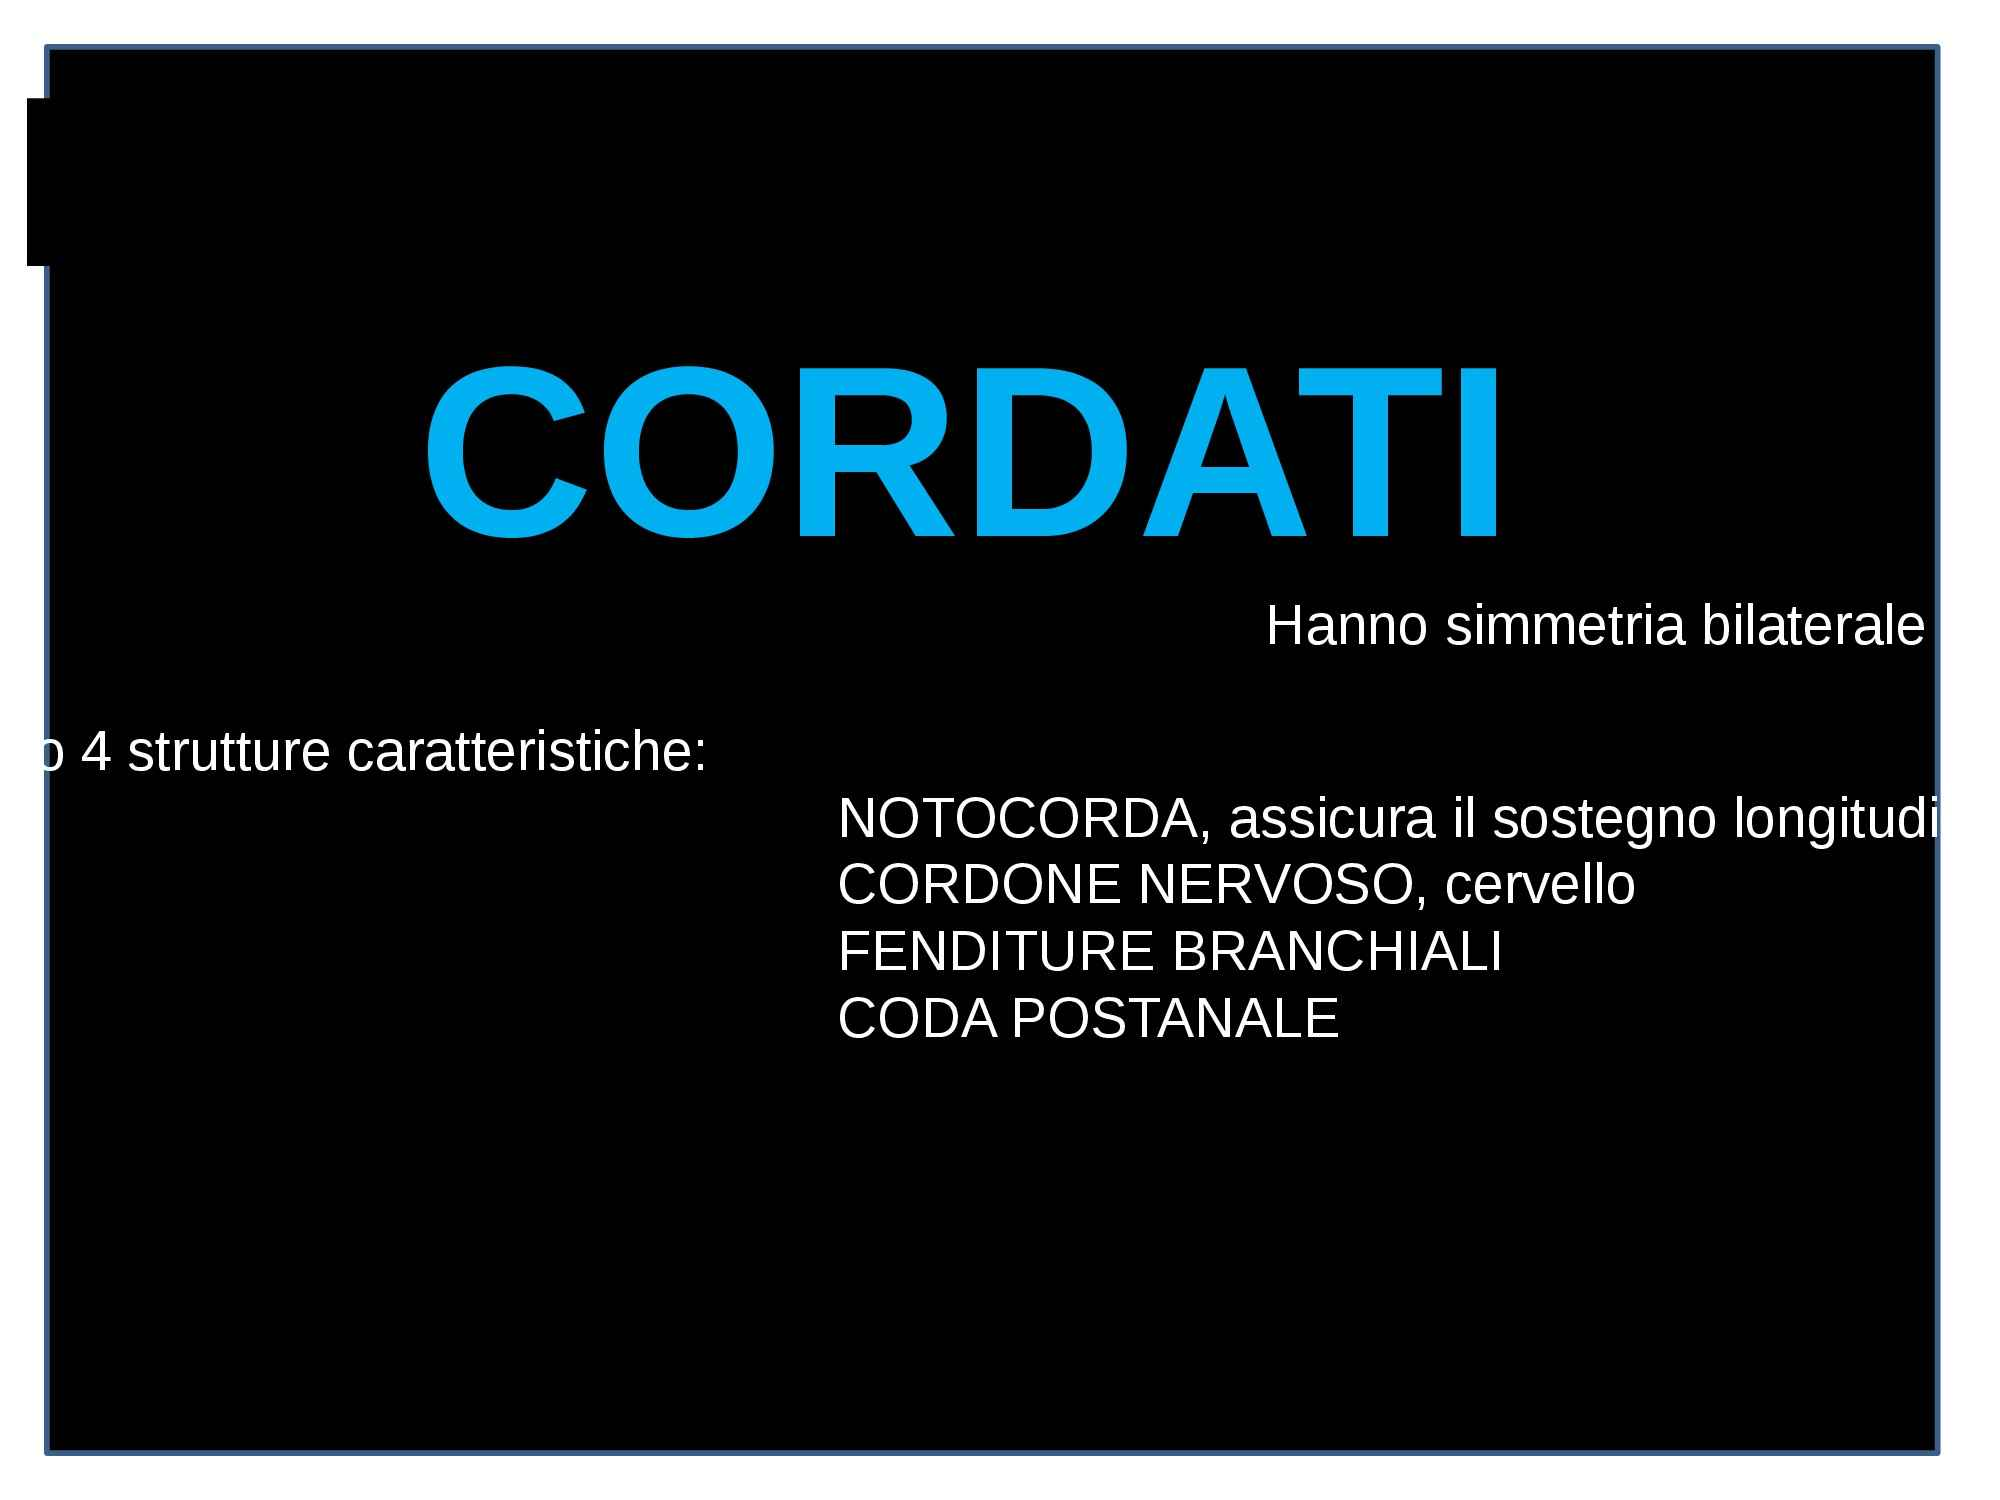 Cordati